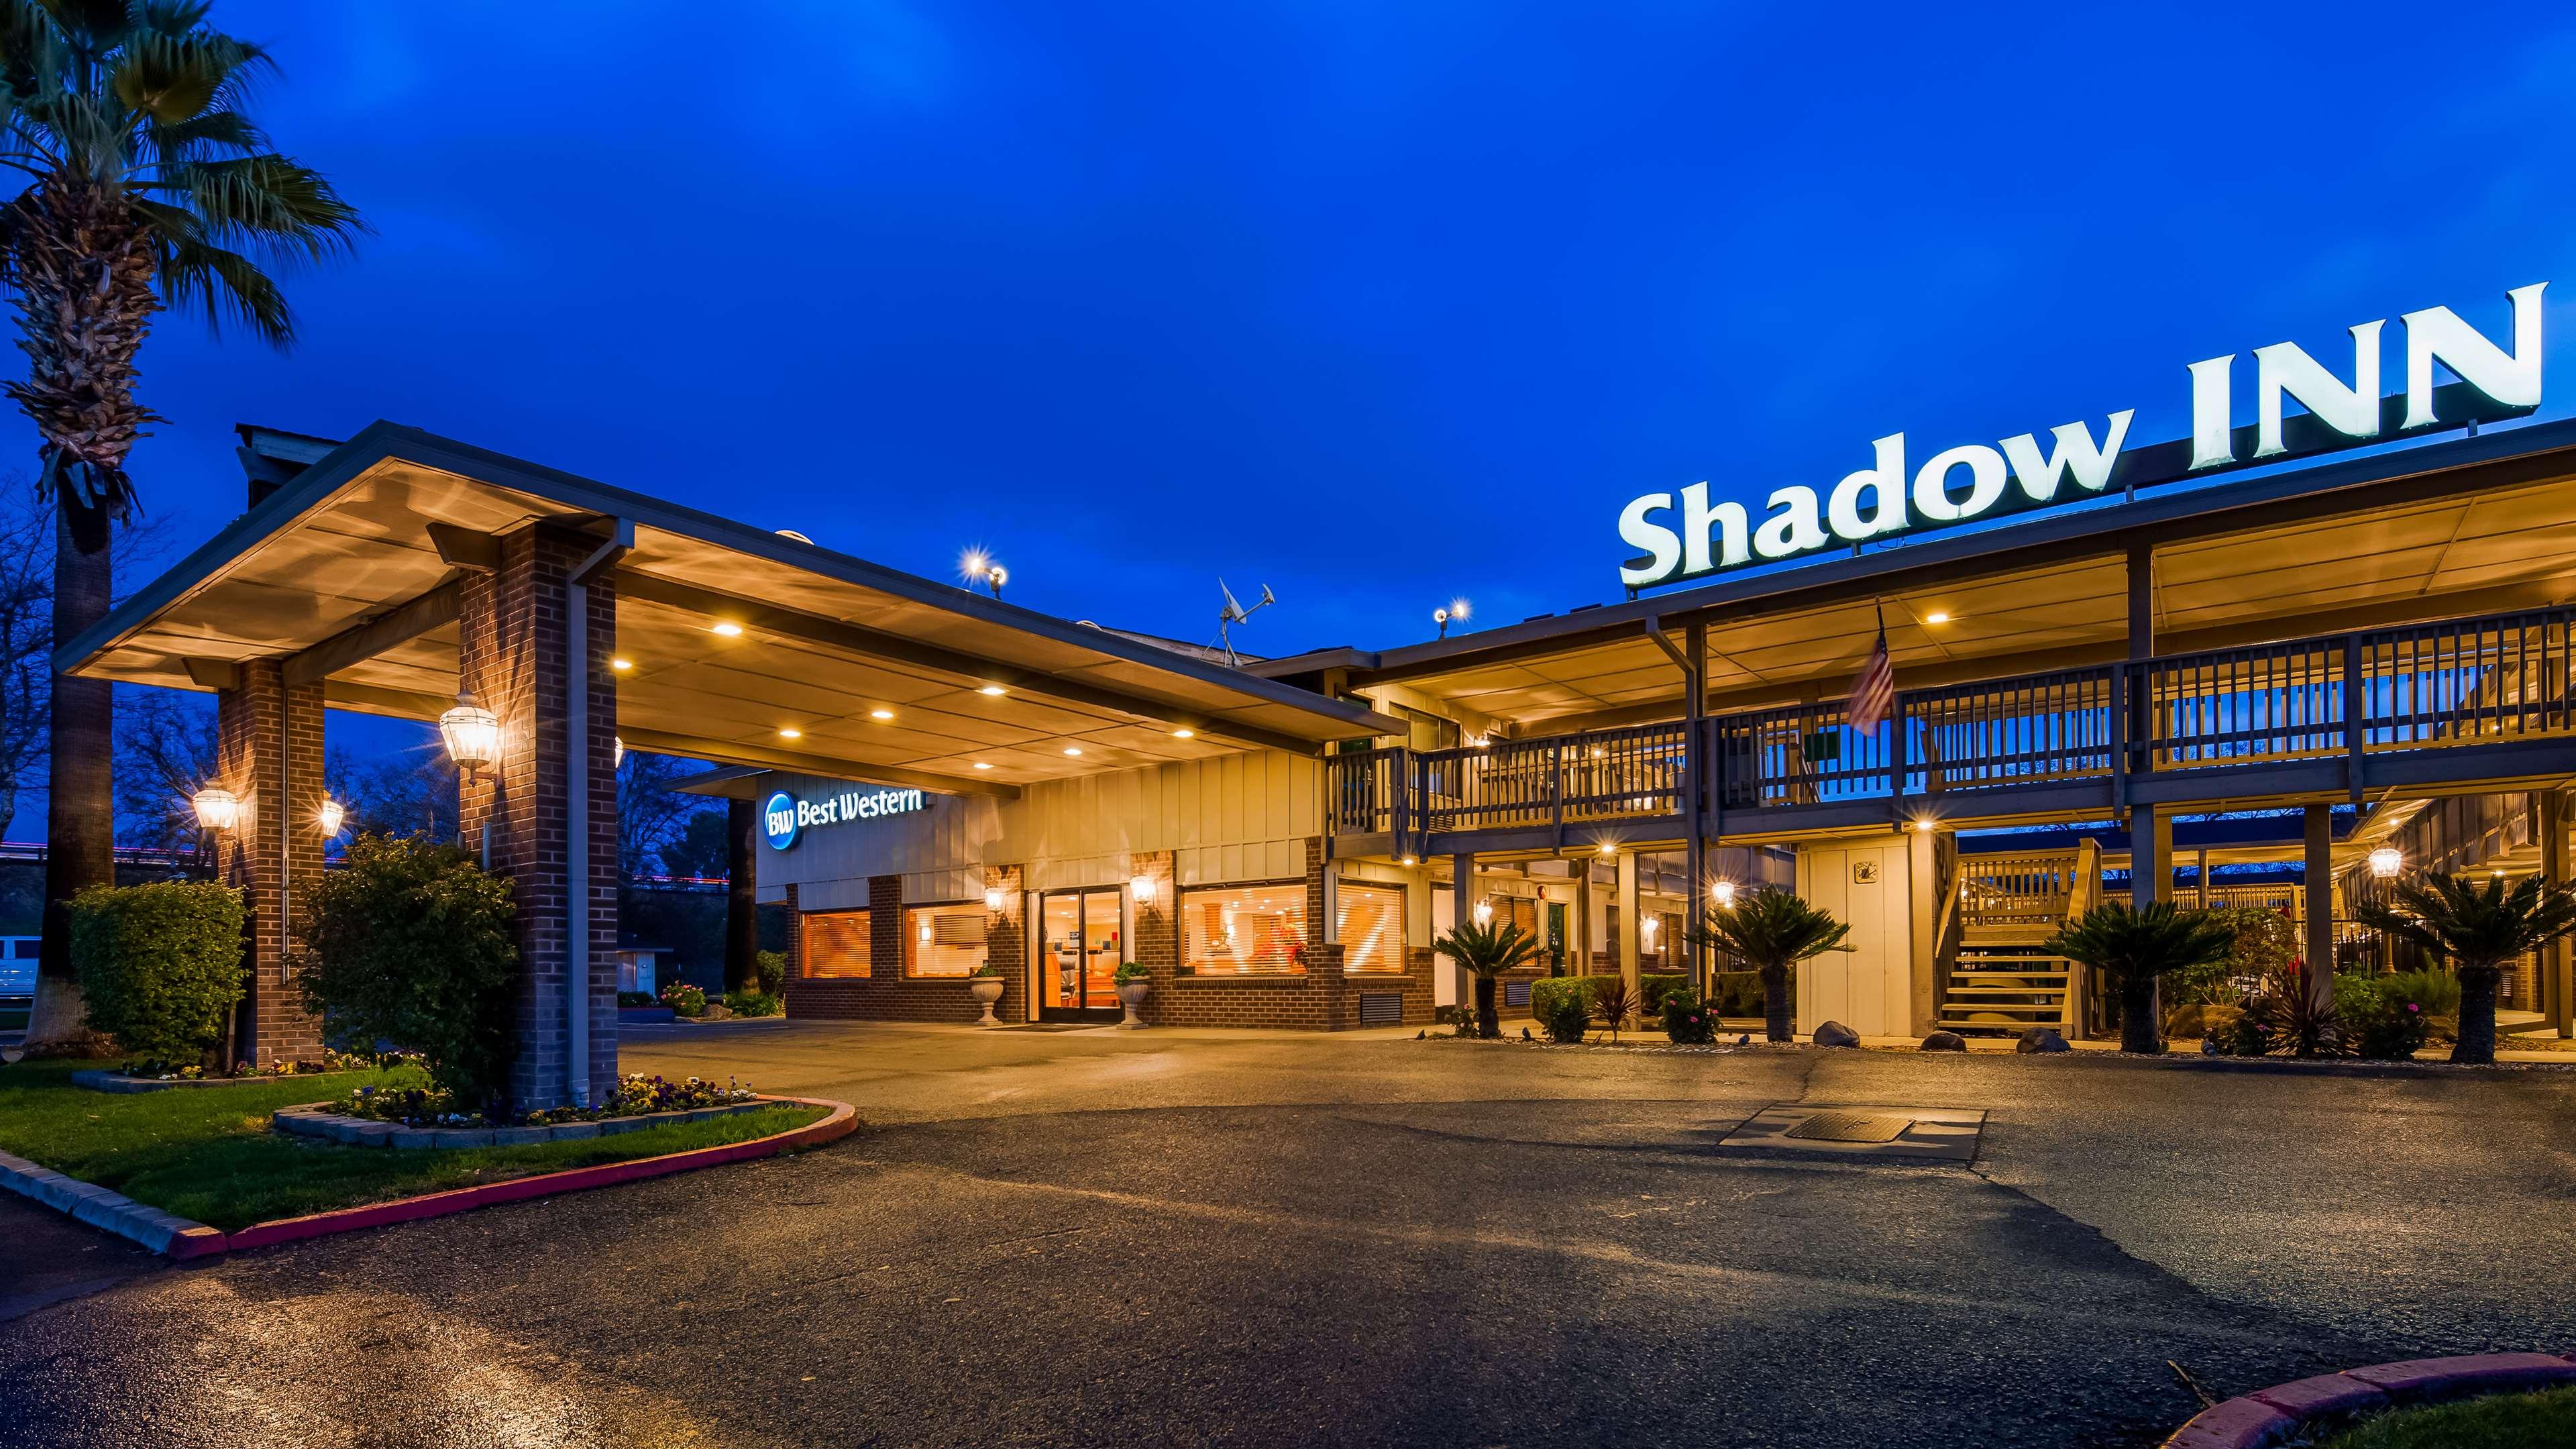 Best Western Shadow Inn image 0